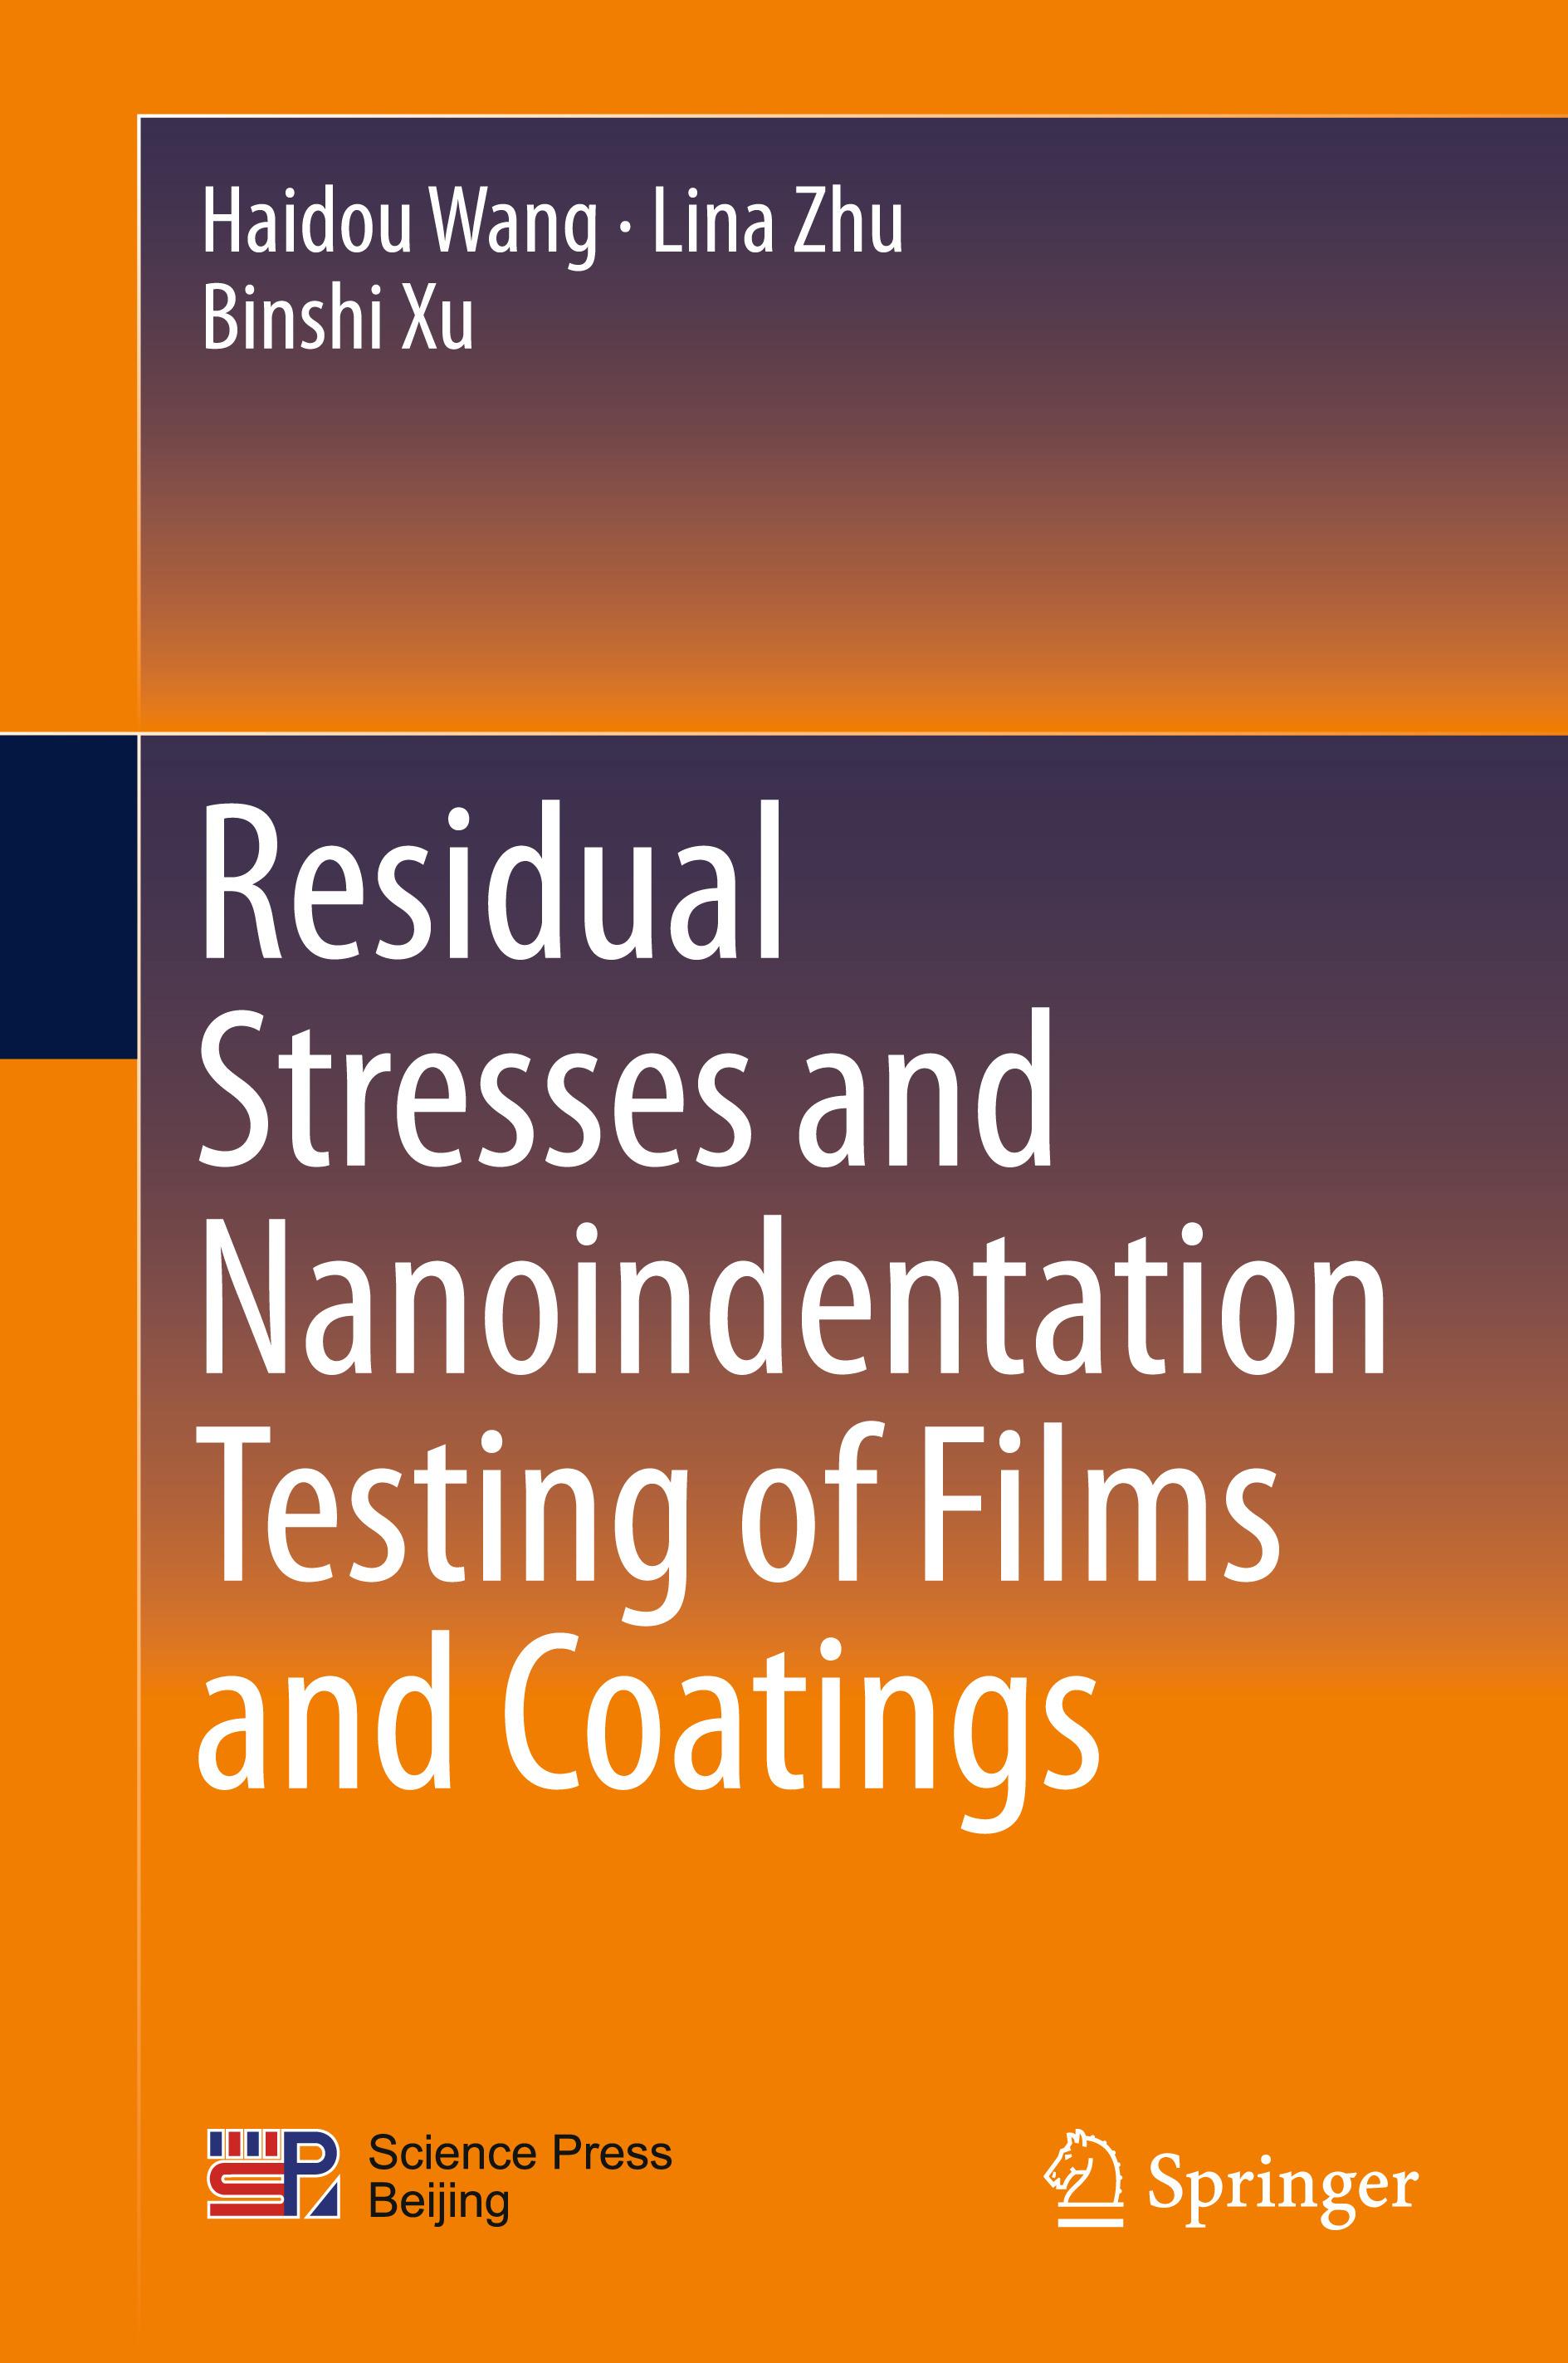 Wang, Haidou - Residual Stresses and Nanoindentation Testing of Films and Coatings, ebook